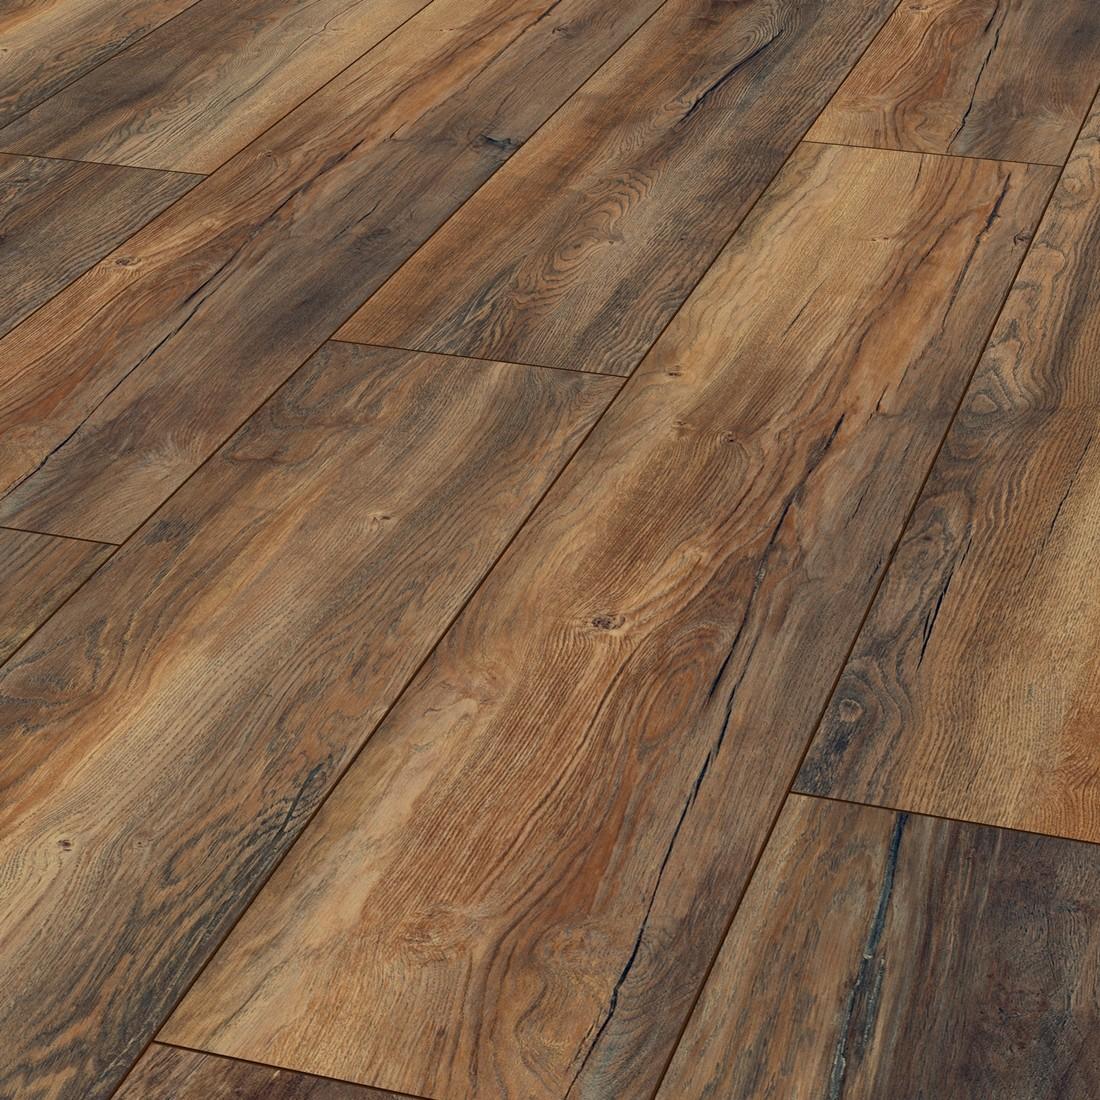 kronotex 13 49 m laminat exquisit harbour oak d3570 inkl leisten und d mmung ebay. Black Bedroom Furniture Sets. Home Design Ideas